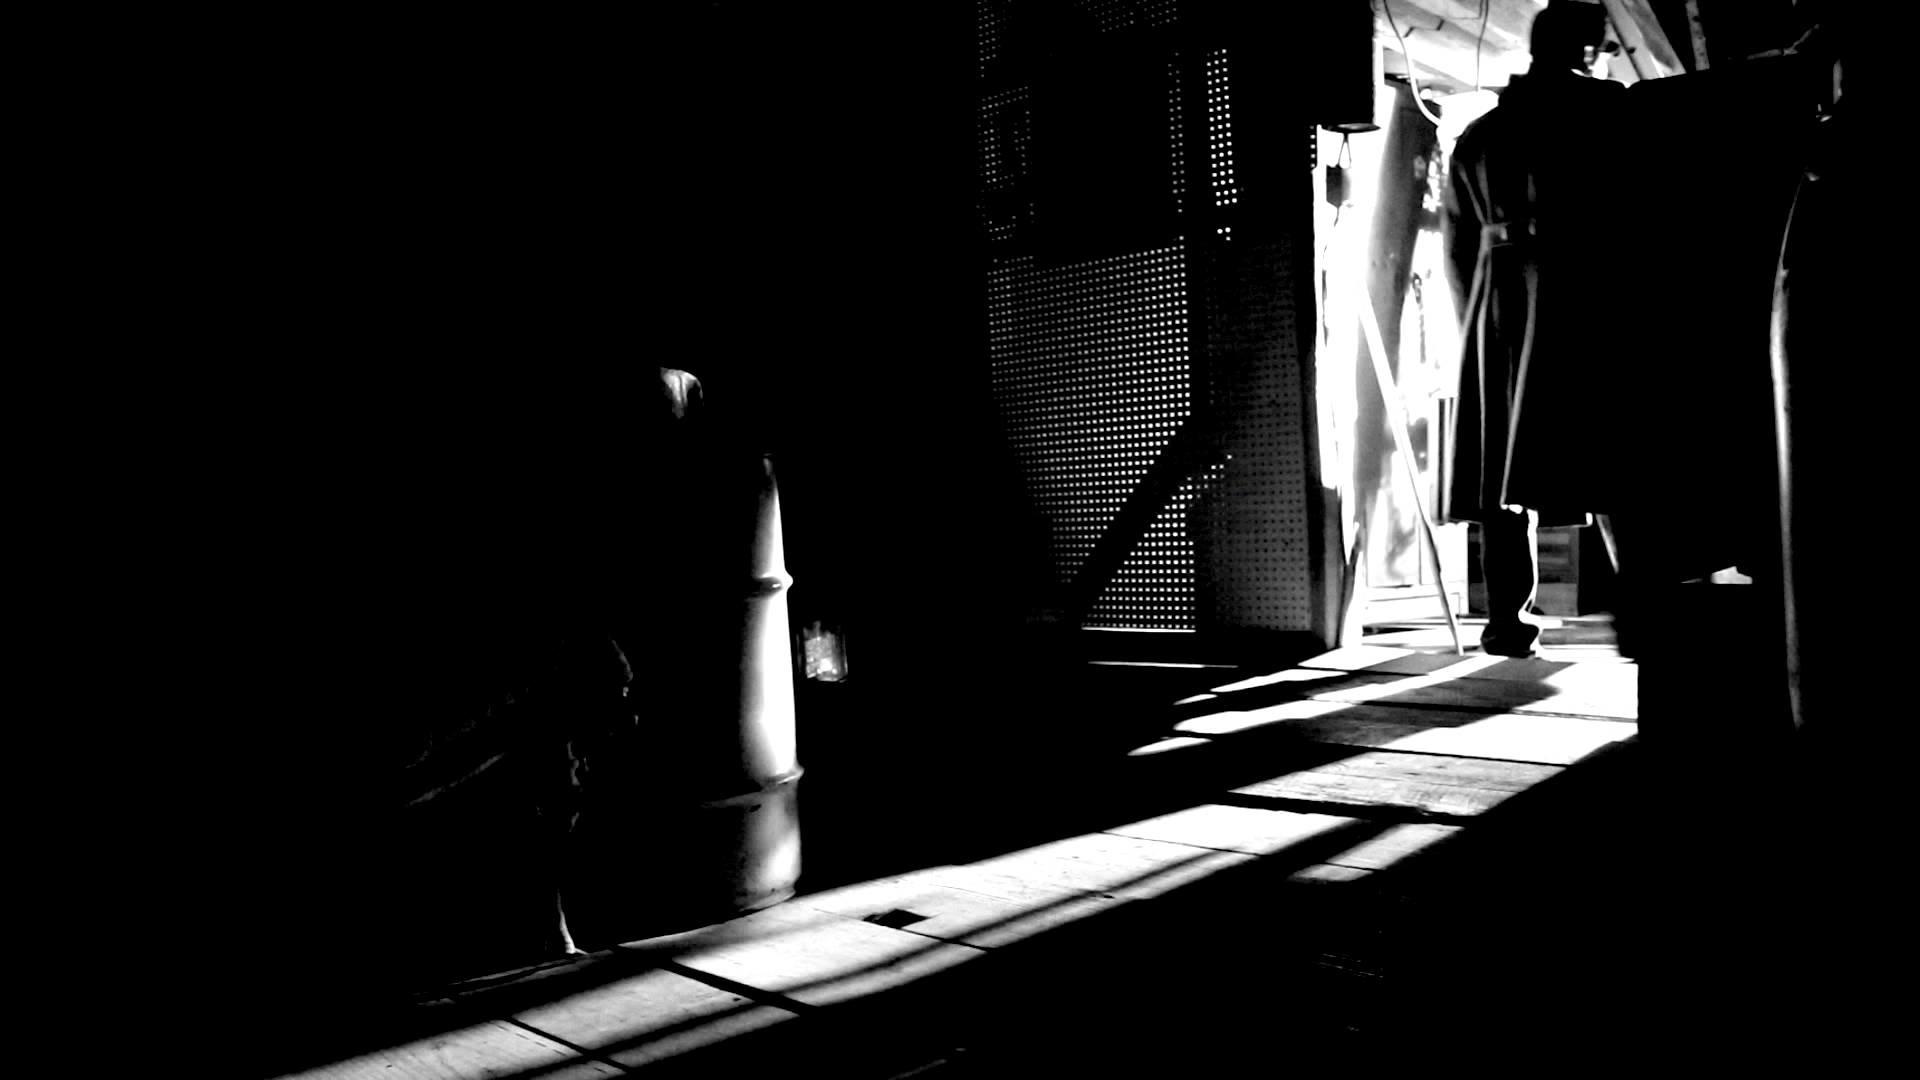 Film Noir Wallpapers 58 Pictures